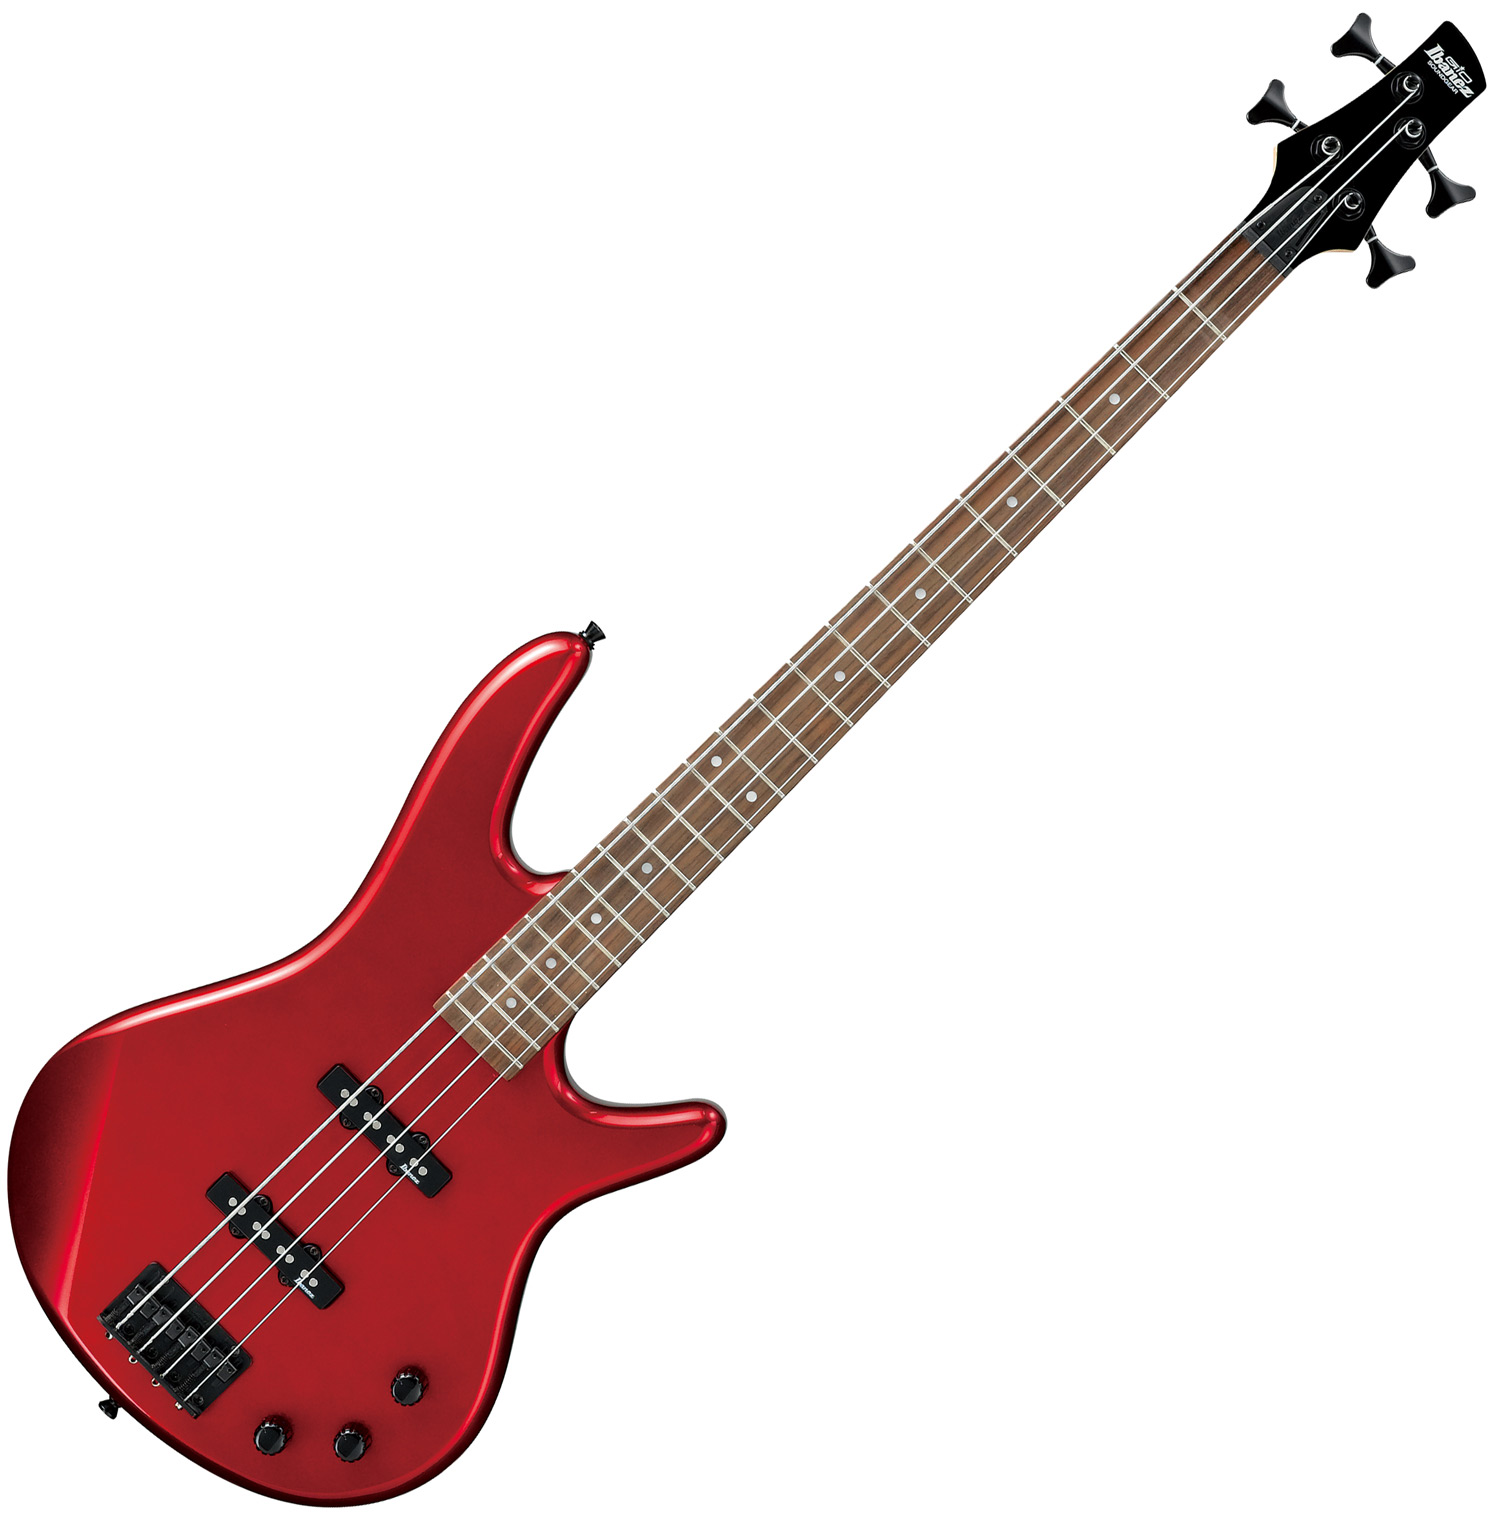 ibanez gsr320ca electric bass guitar katoomba music. Black Bedroom Furniture Sets. Home Design Ideas